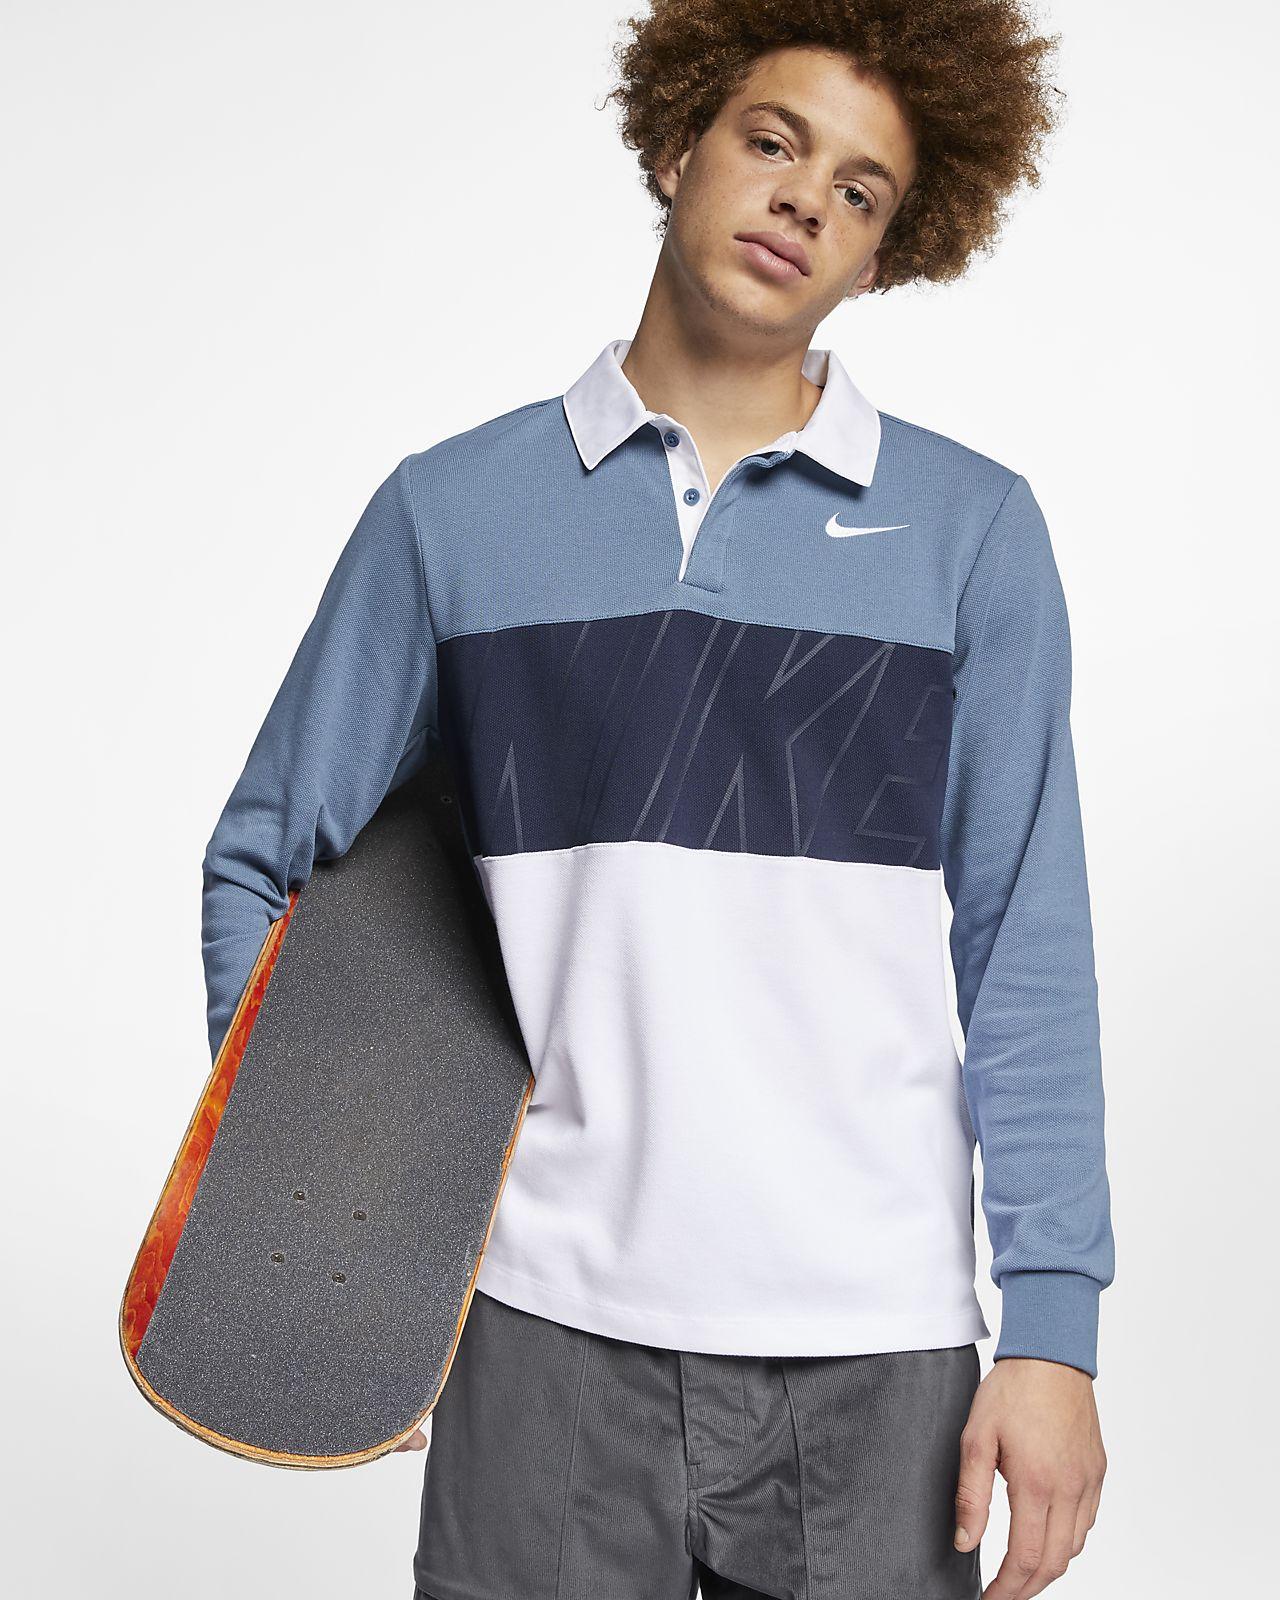 Polo da skate a manica lunga Nike SB Dri-FIT - Uomo